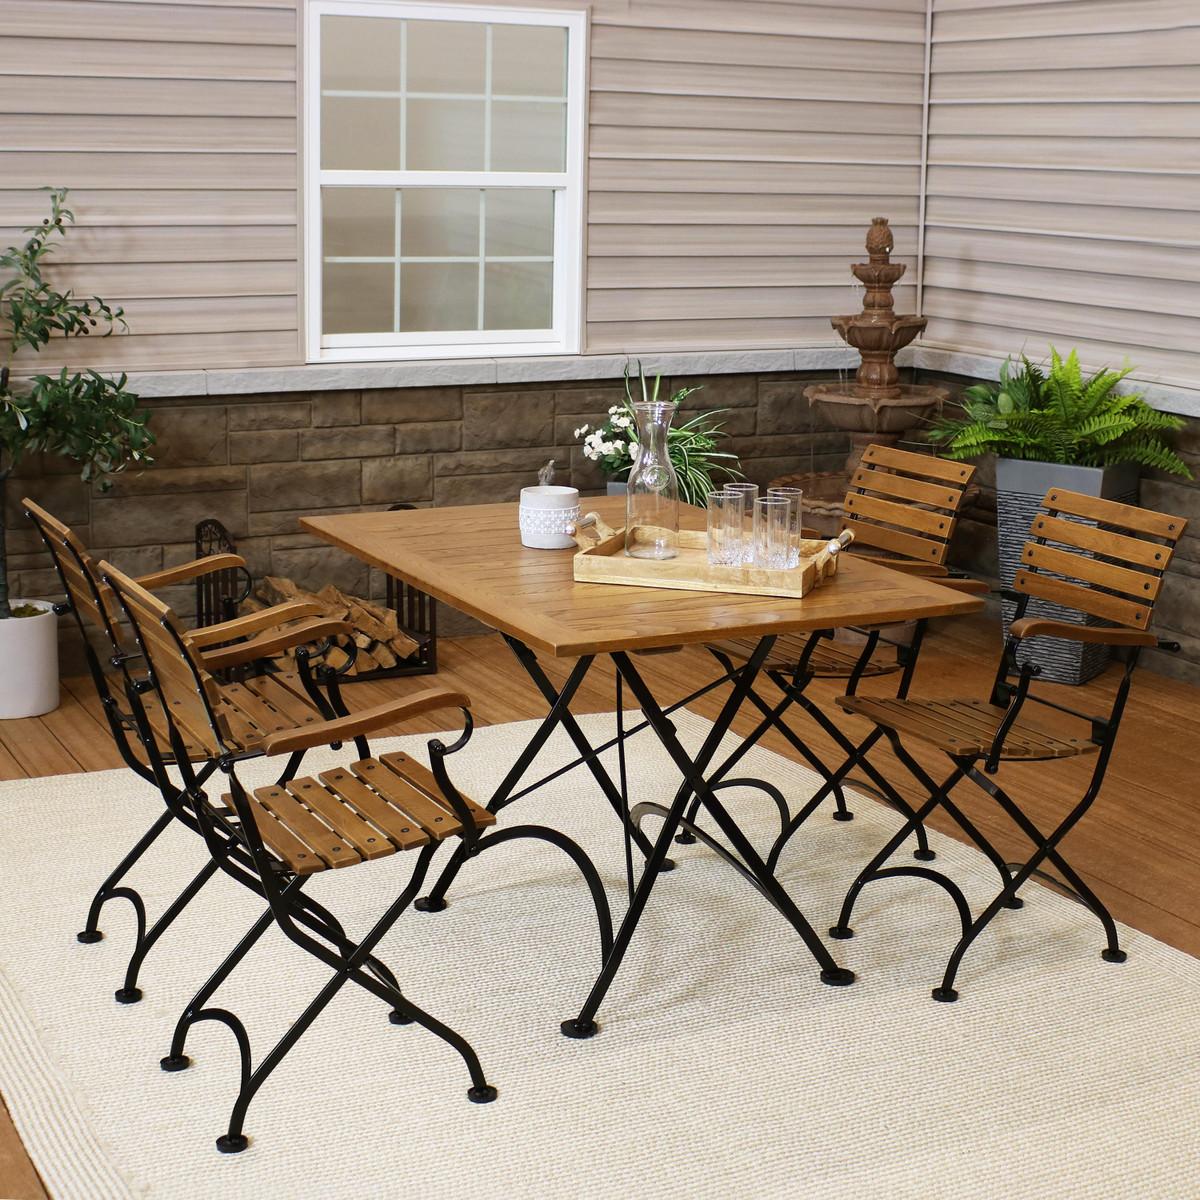 Sunnydaze Essential European Chestnut Wood 5 Piece Folding Table And Chairs Set